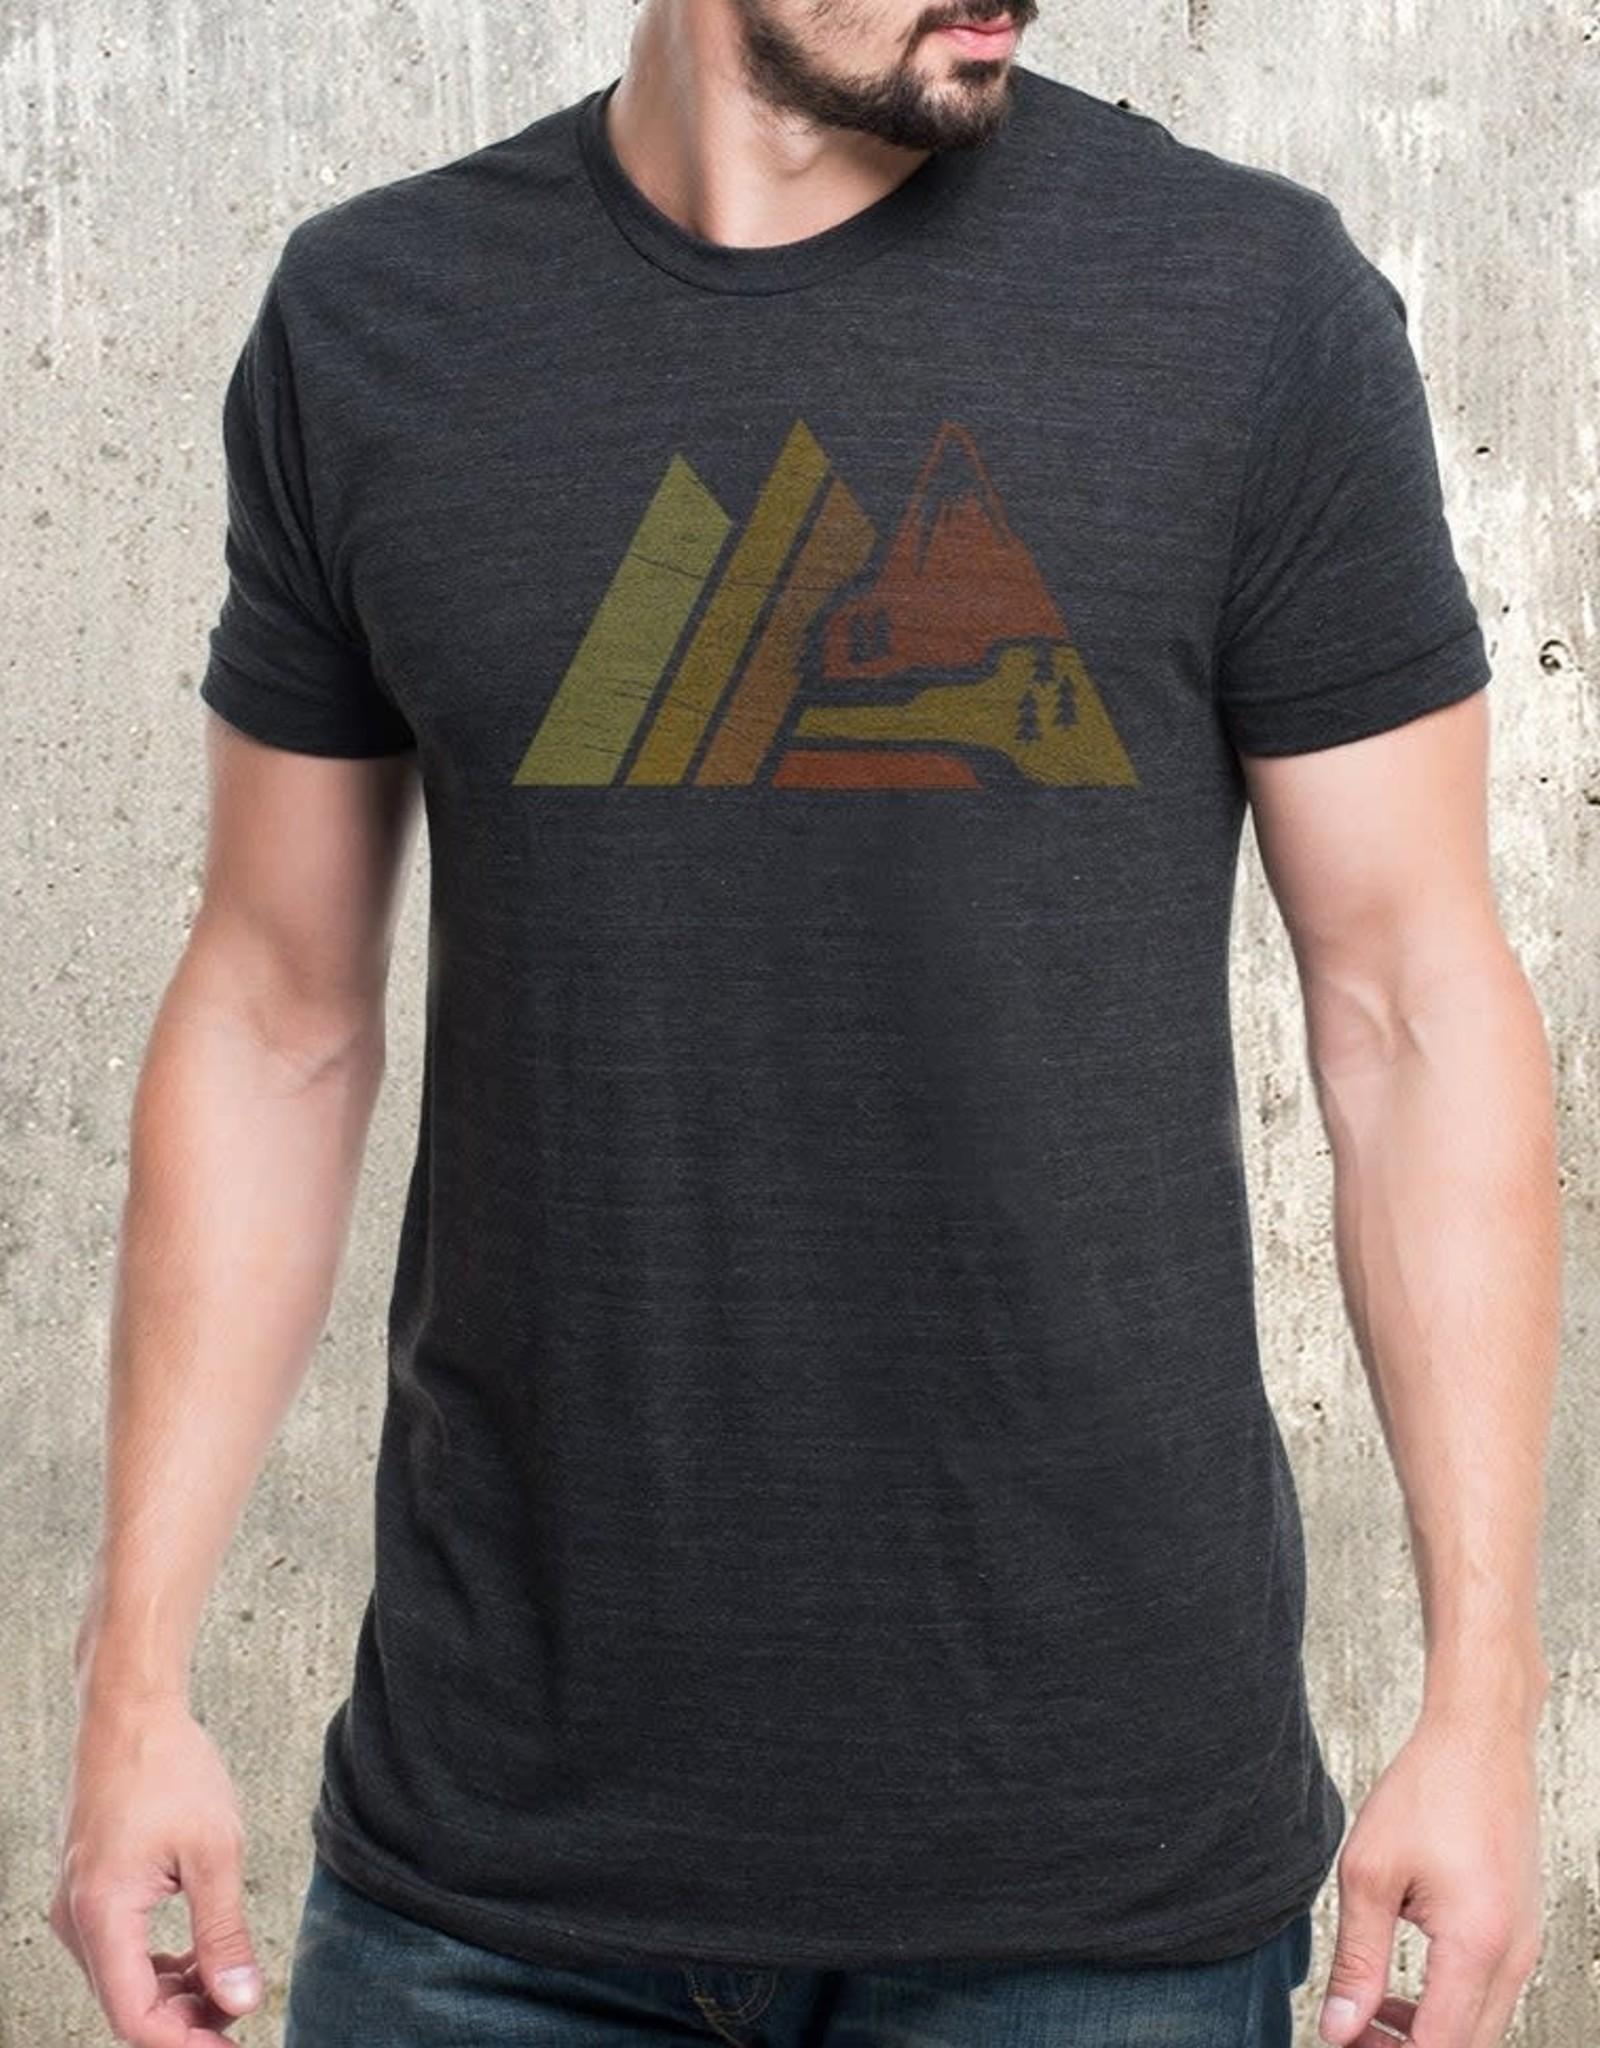 Black Lantern Black Lantern - T-Shirt -